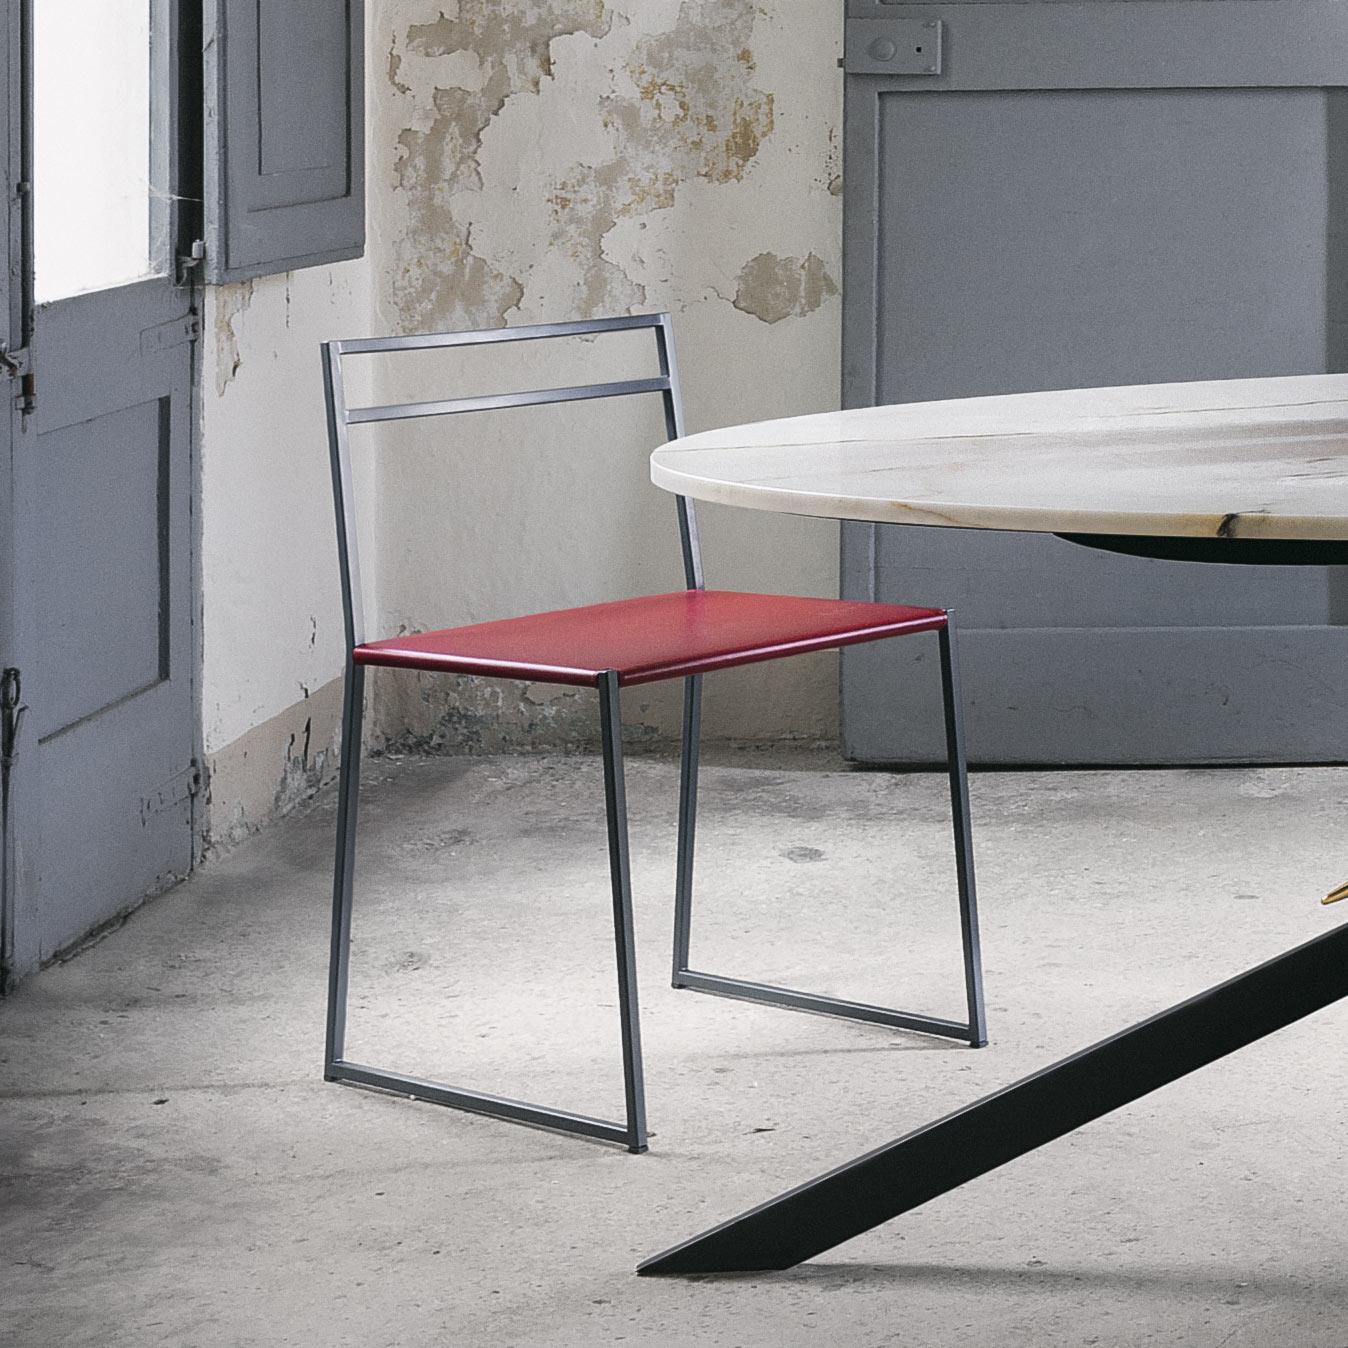 Sedia minimalista contemporanea design Luca Casini